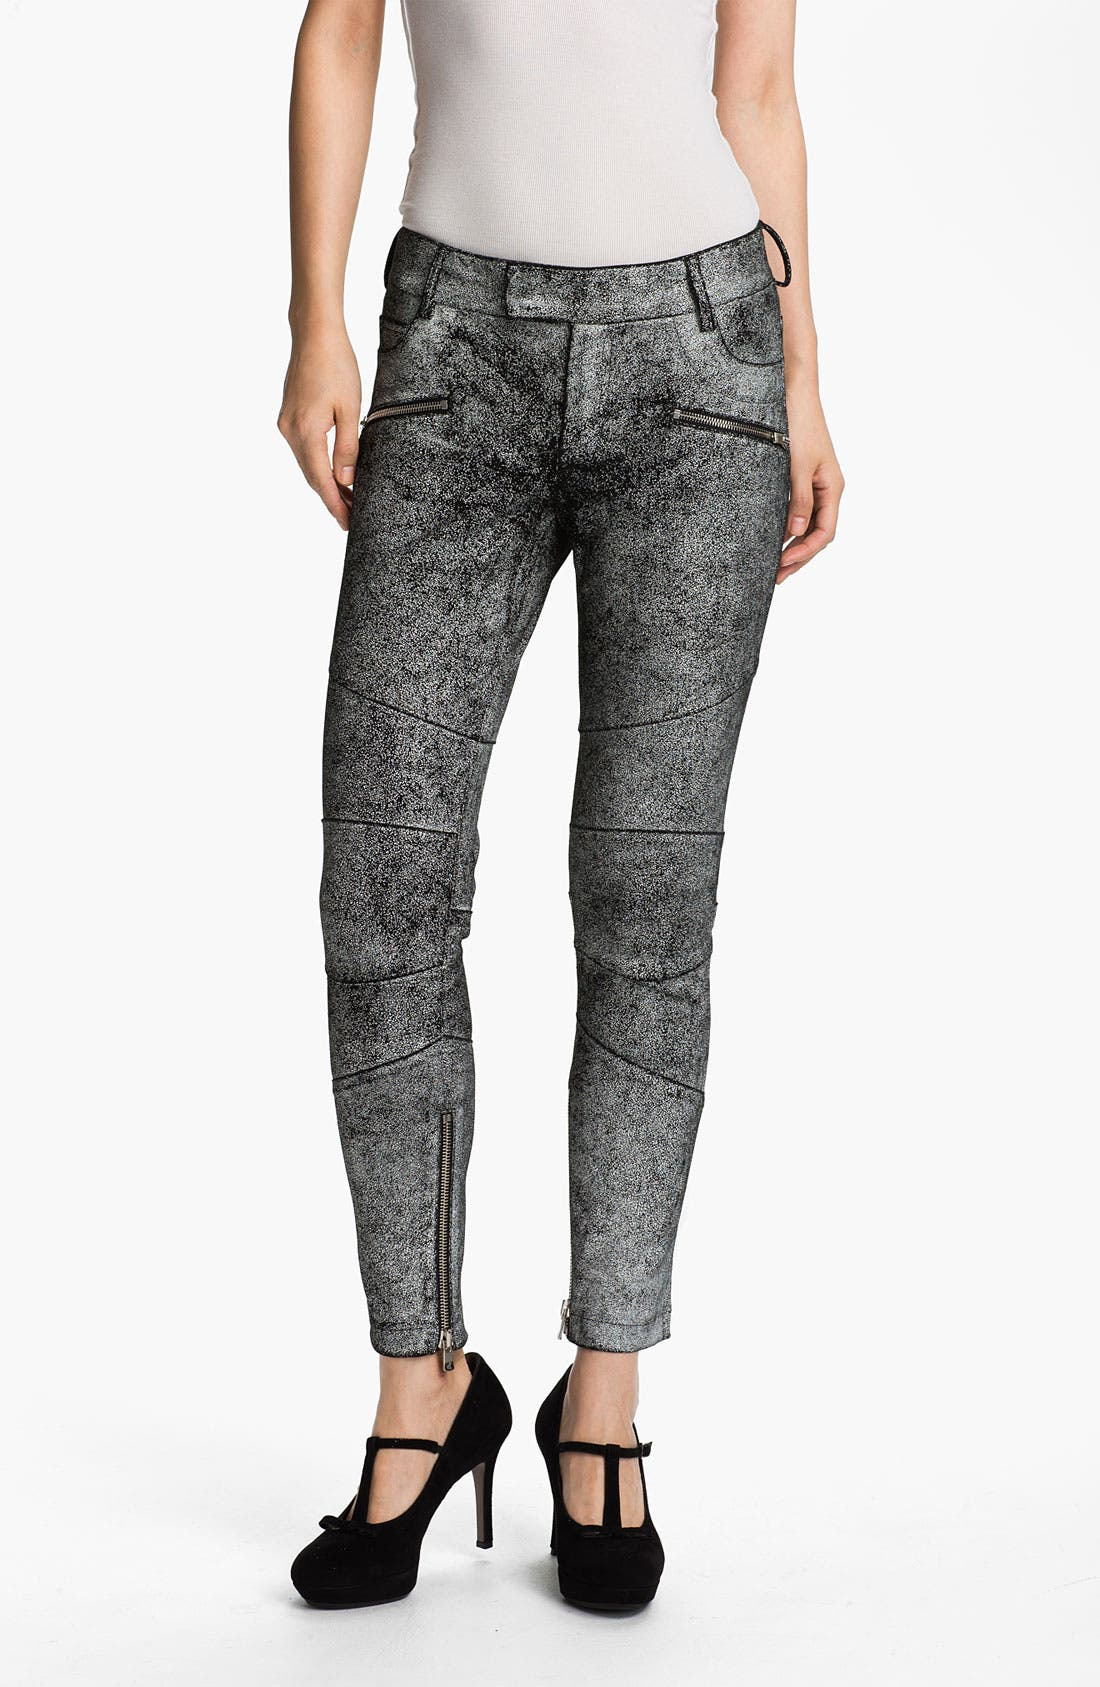 Alternate Image 1 Selected - Skaist-Taylor Cracked Leather Moto Pants